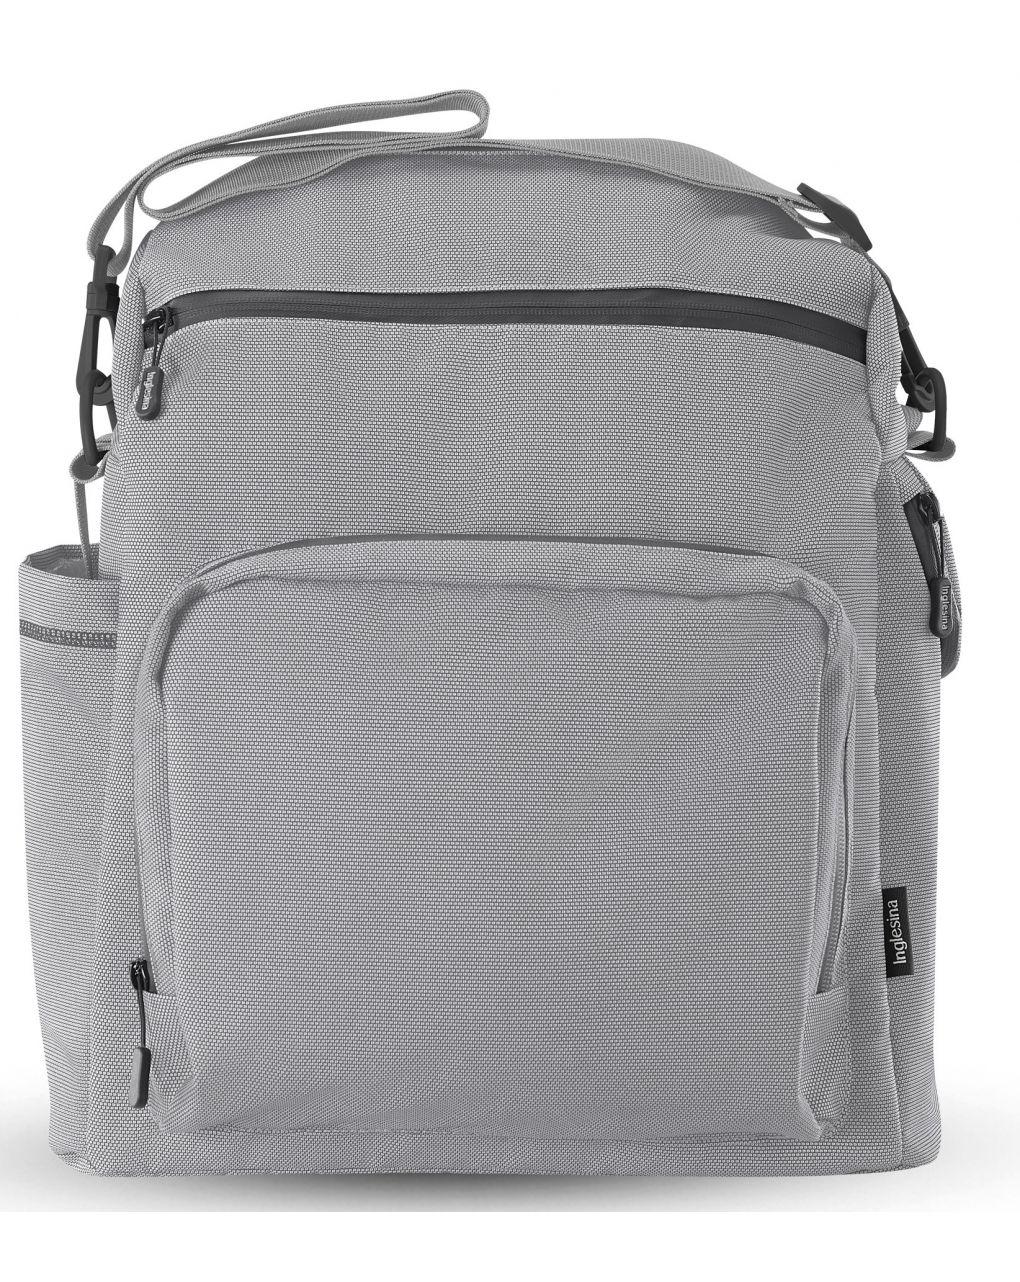 Inglesina Adventure Bag Aptica XT Τσάντα-Αλλαξιέρα Back Pack Horizon Grey